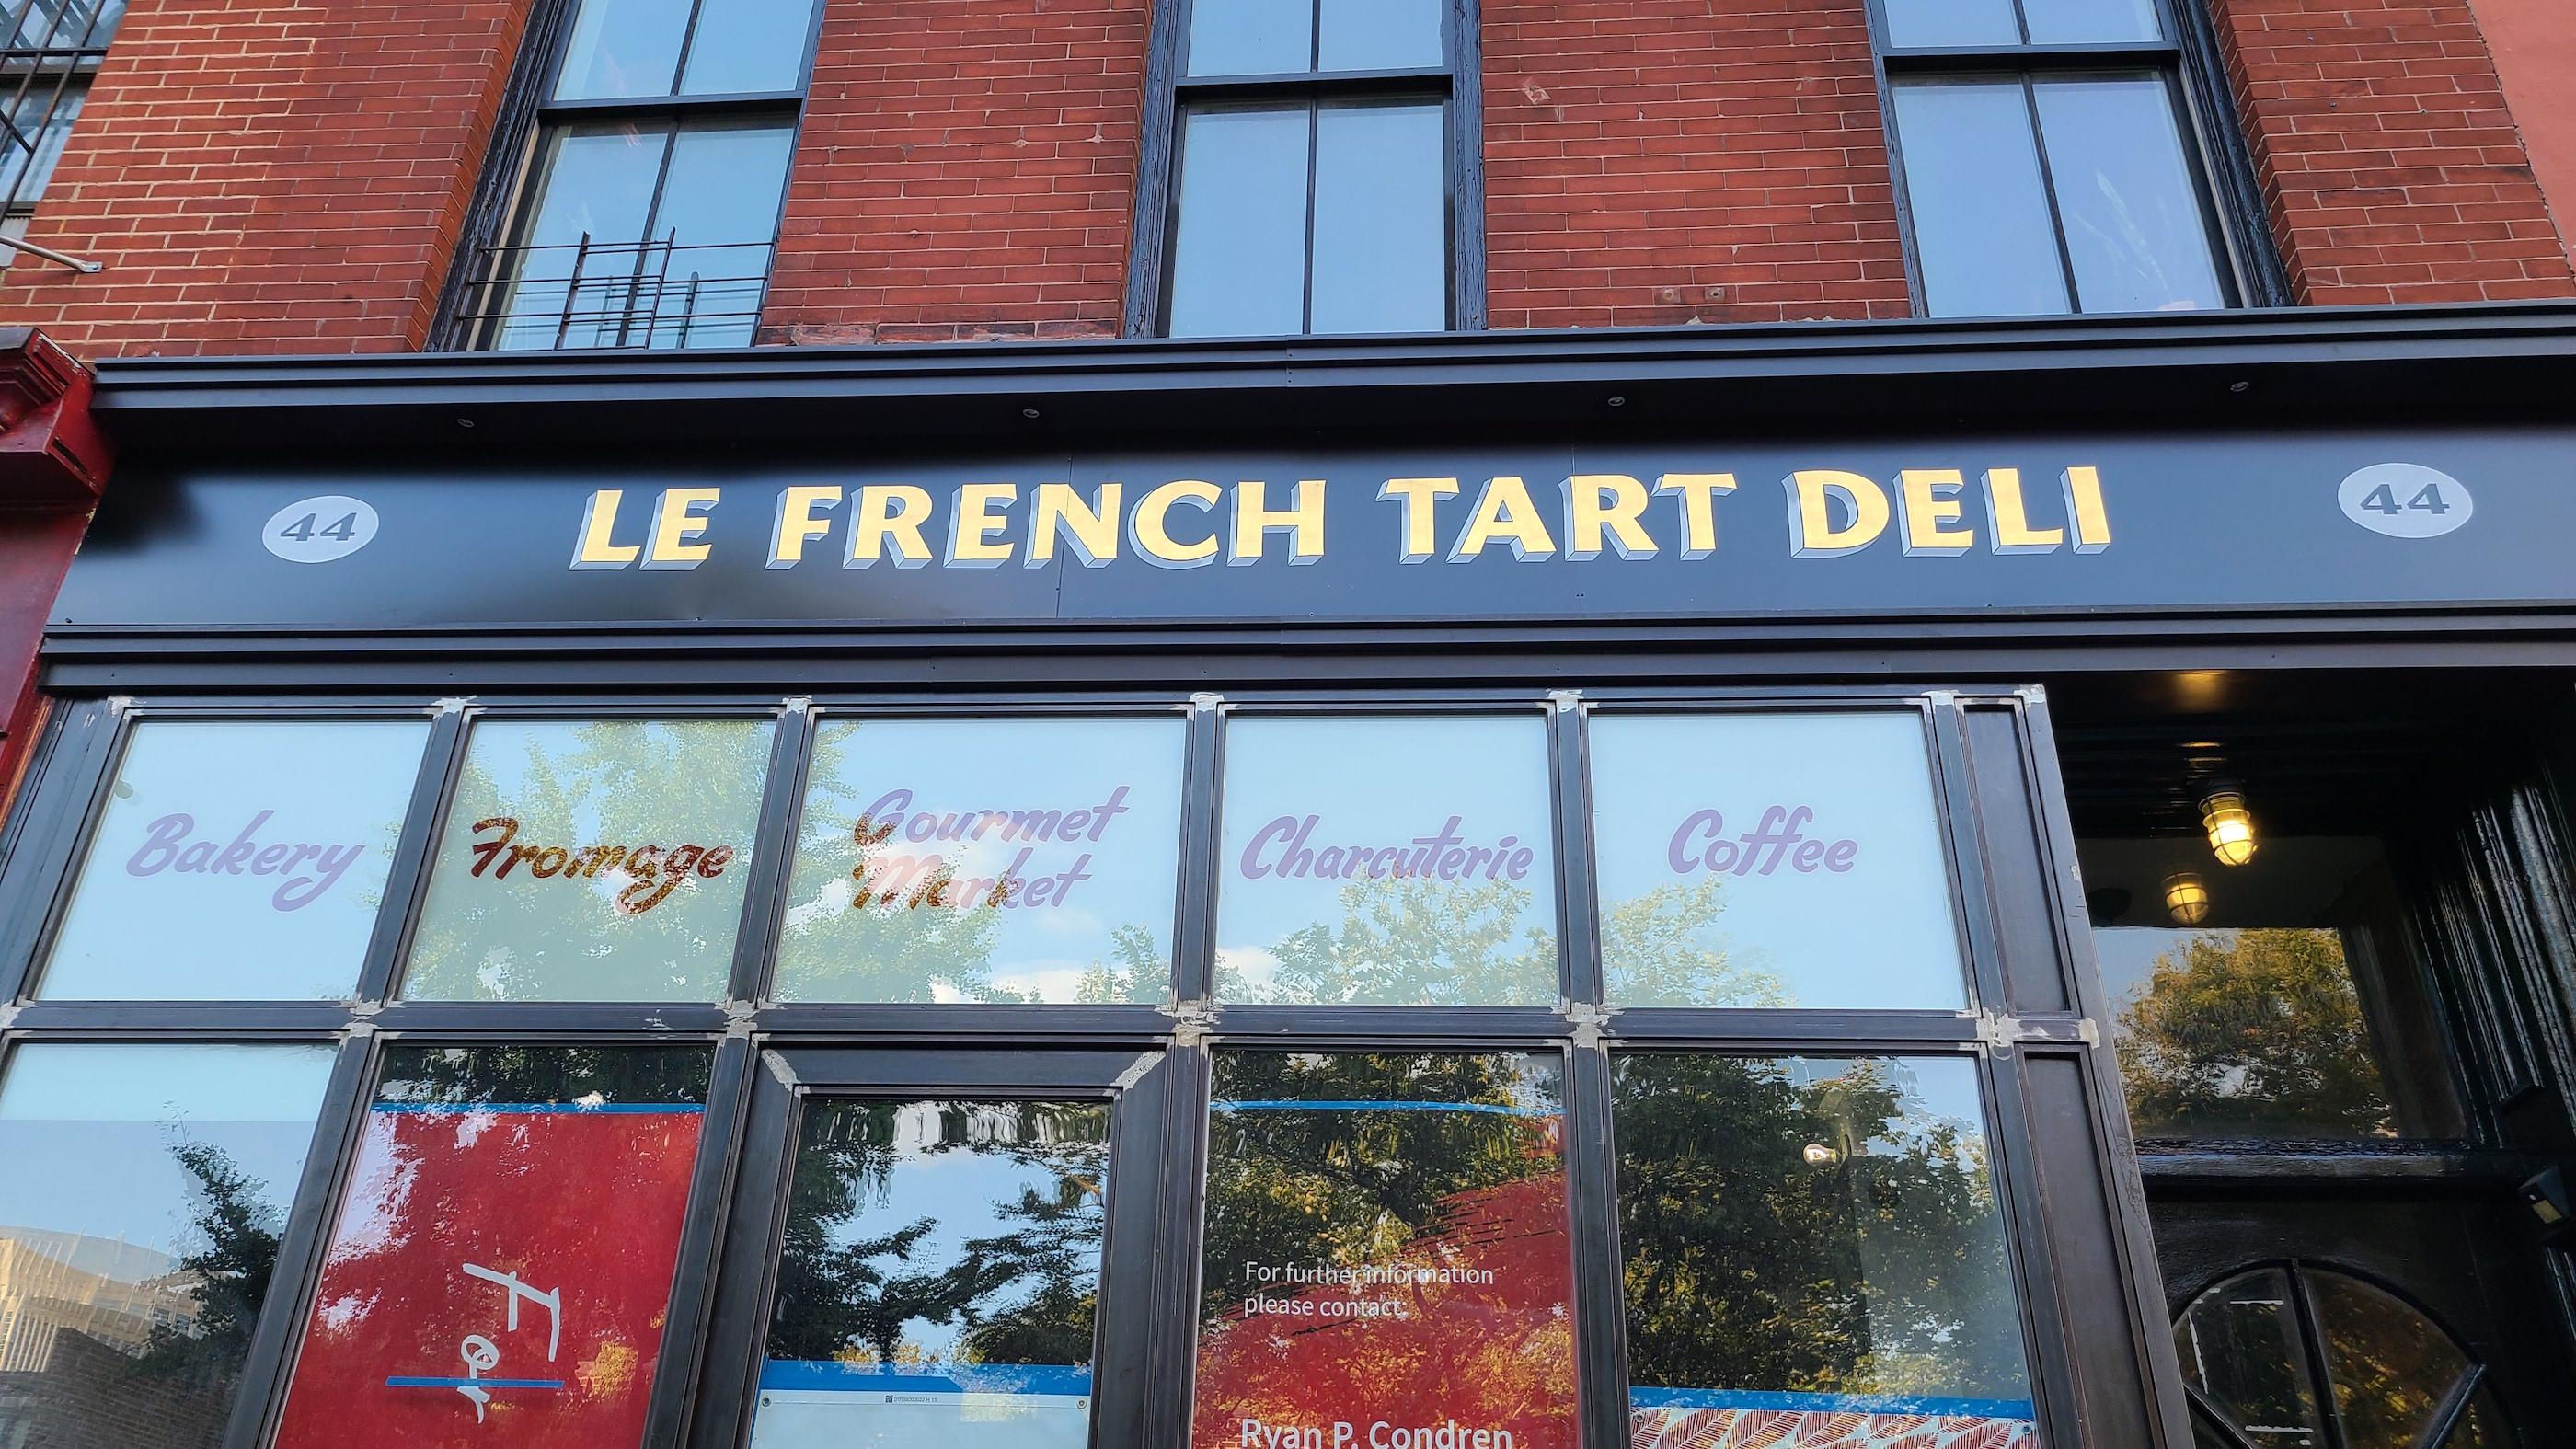 FrenchTartDeli